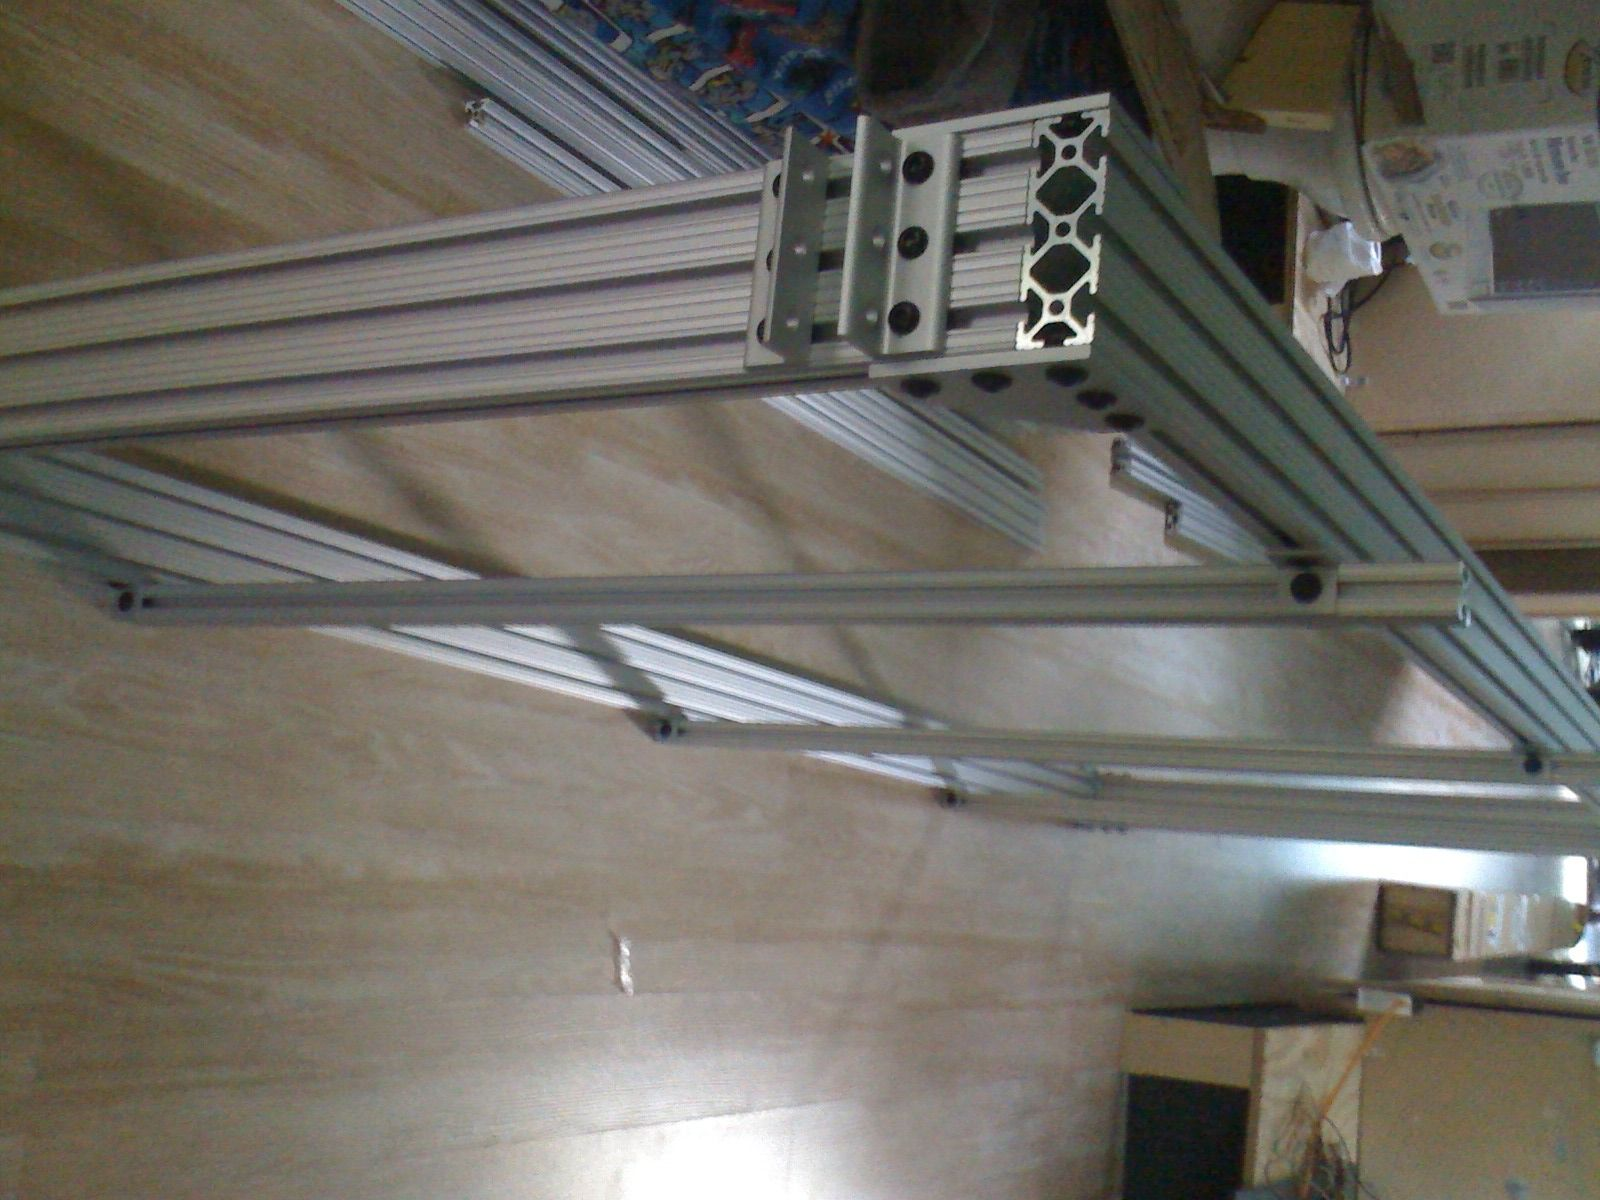 Bunk Beds 8020 Kit Extruded Aluminum Bunk Beds Camper